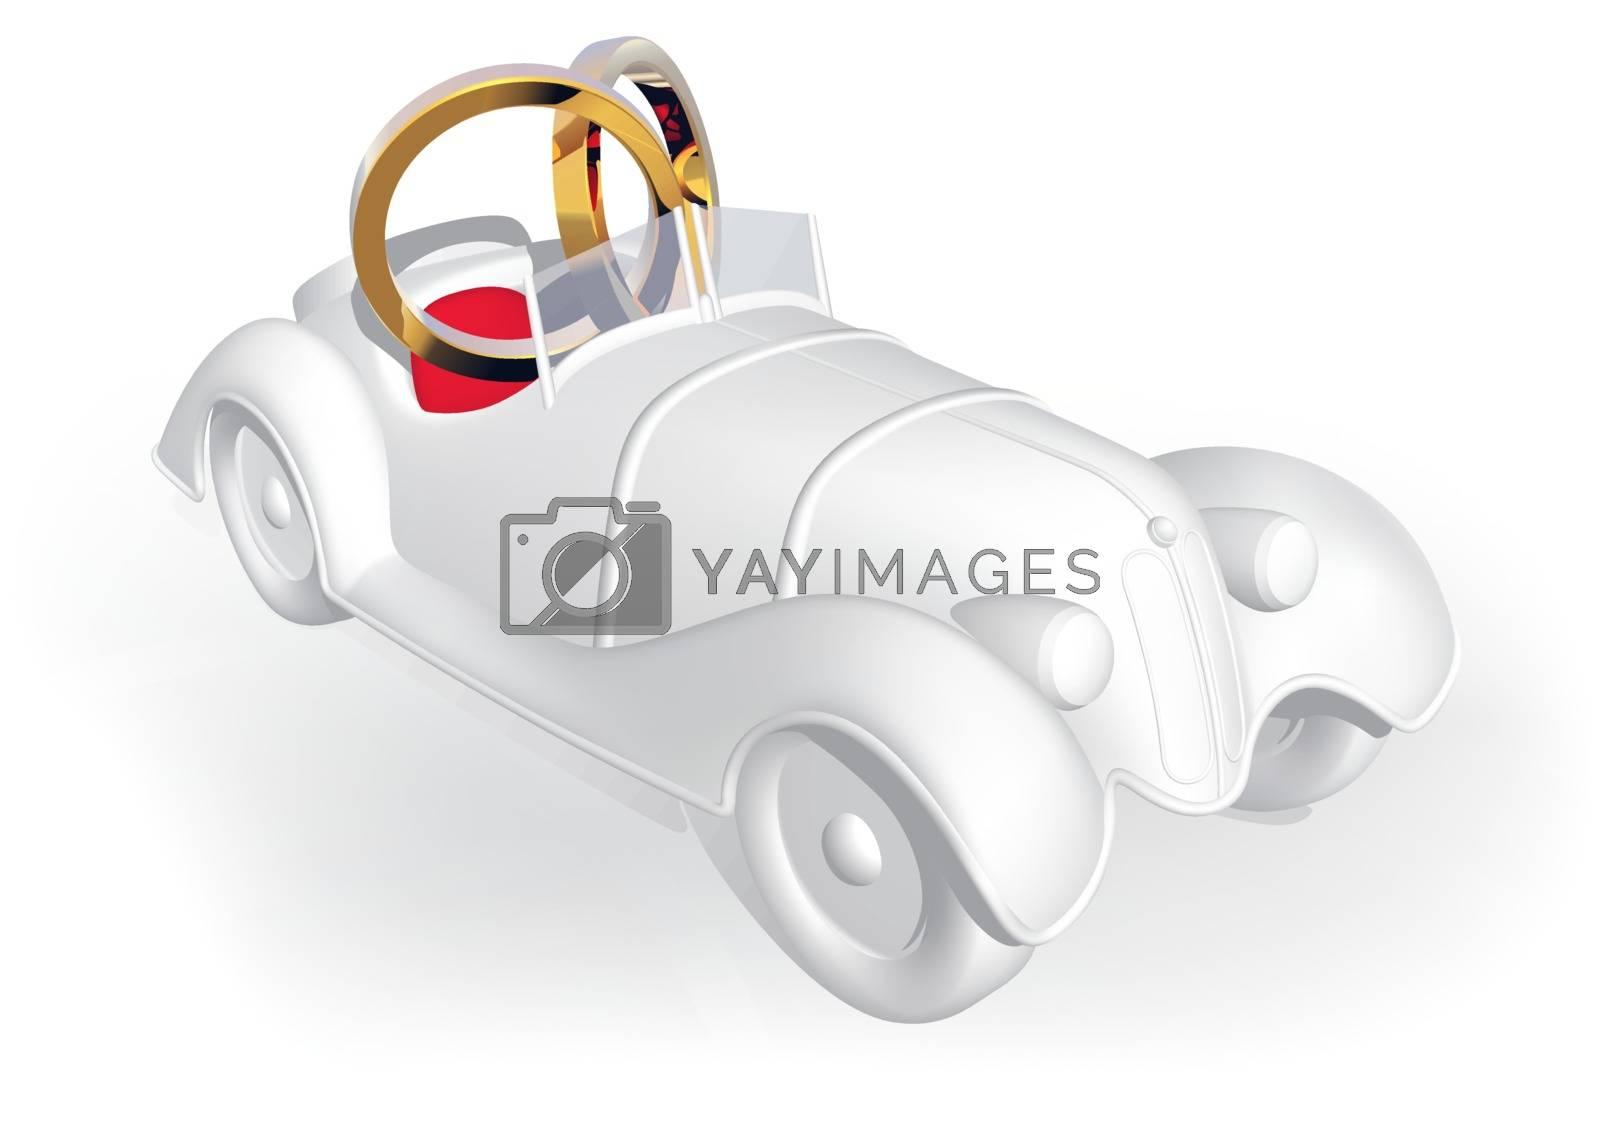 Wedding Car - Colored Illustration, Vector